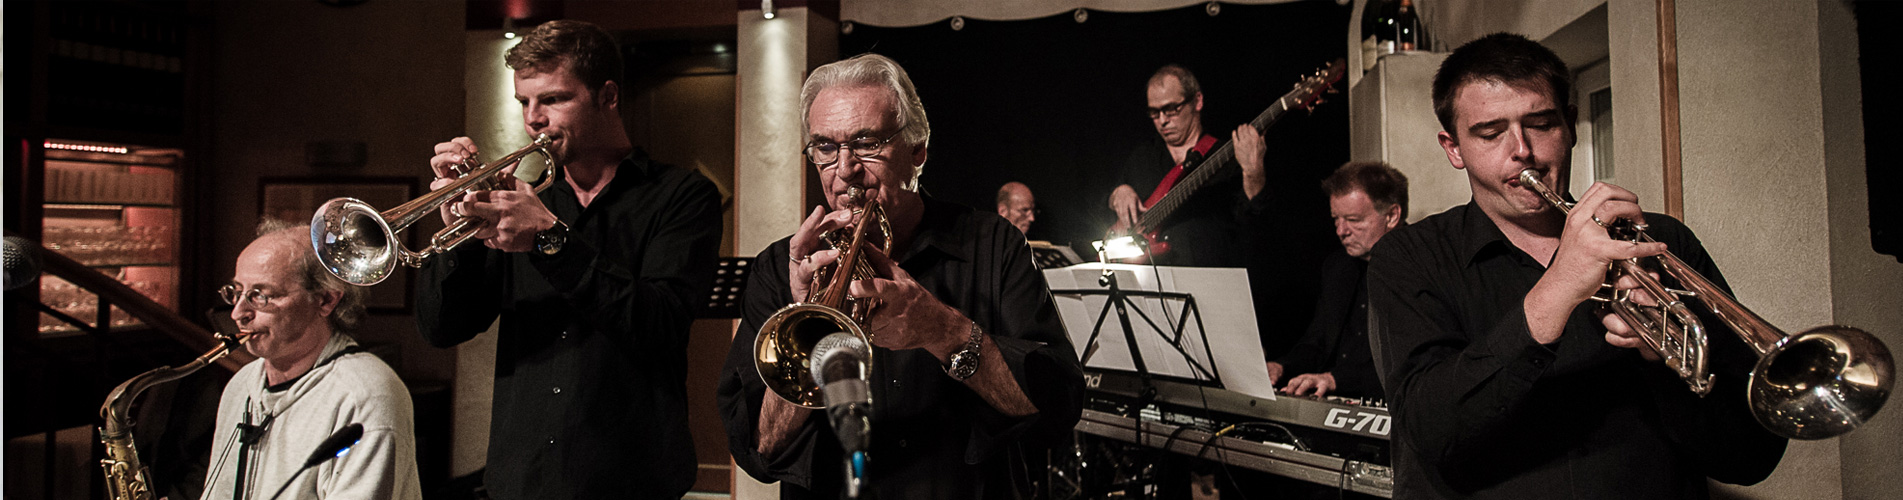 Klaus Heimanns Horns Unlimited Jazzkonzert Jazzclub Hamm e.V. Foto Steff Aperdannier